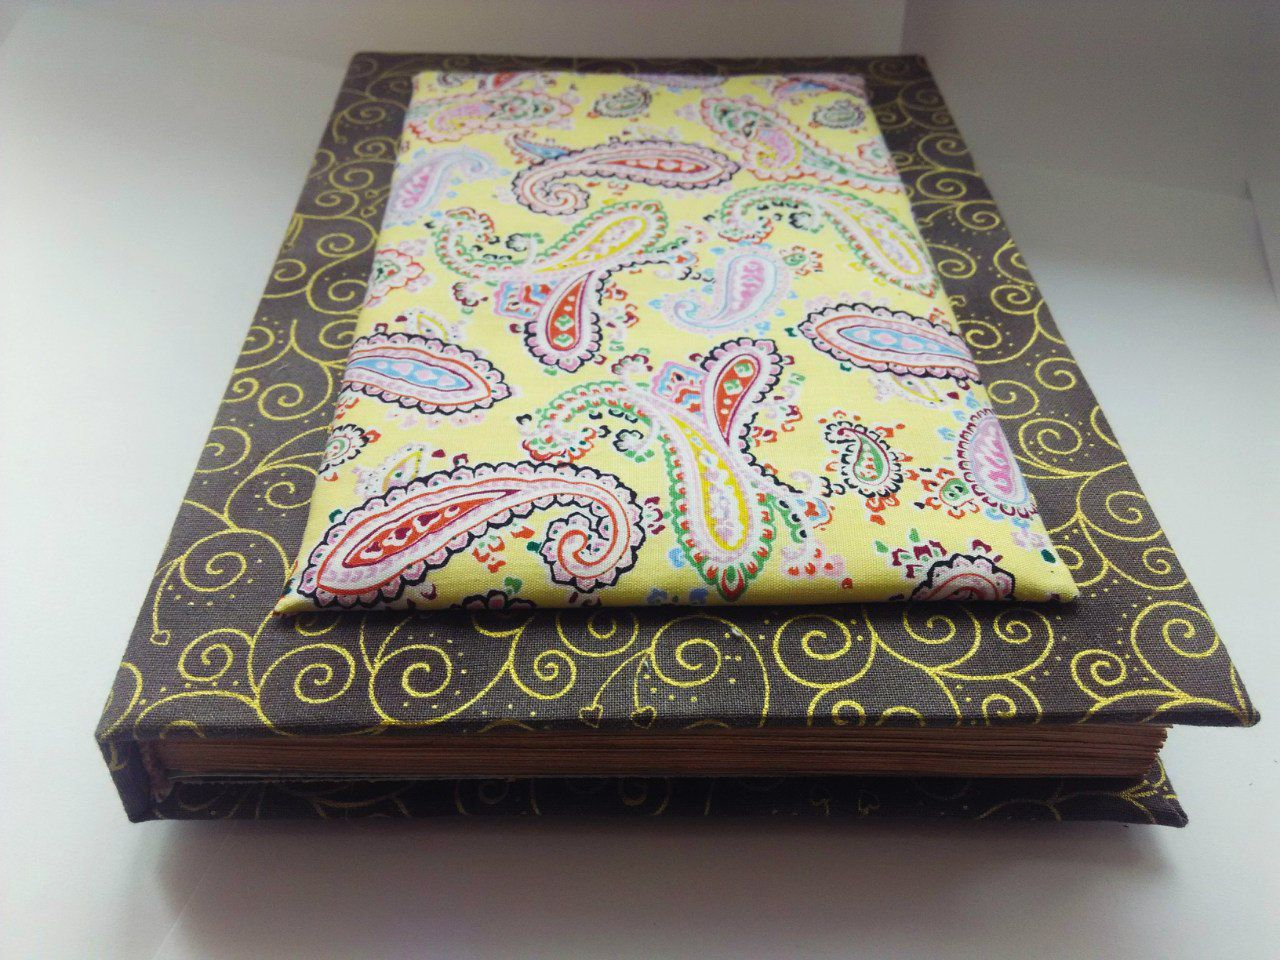 goldenpattern paisley notebook handmade